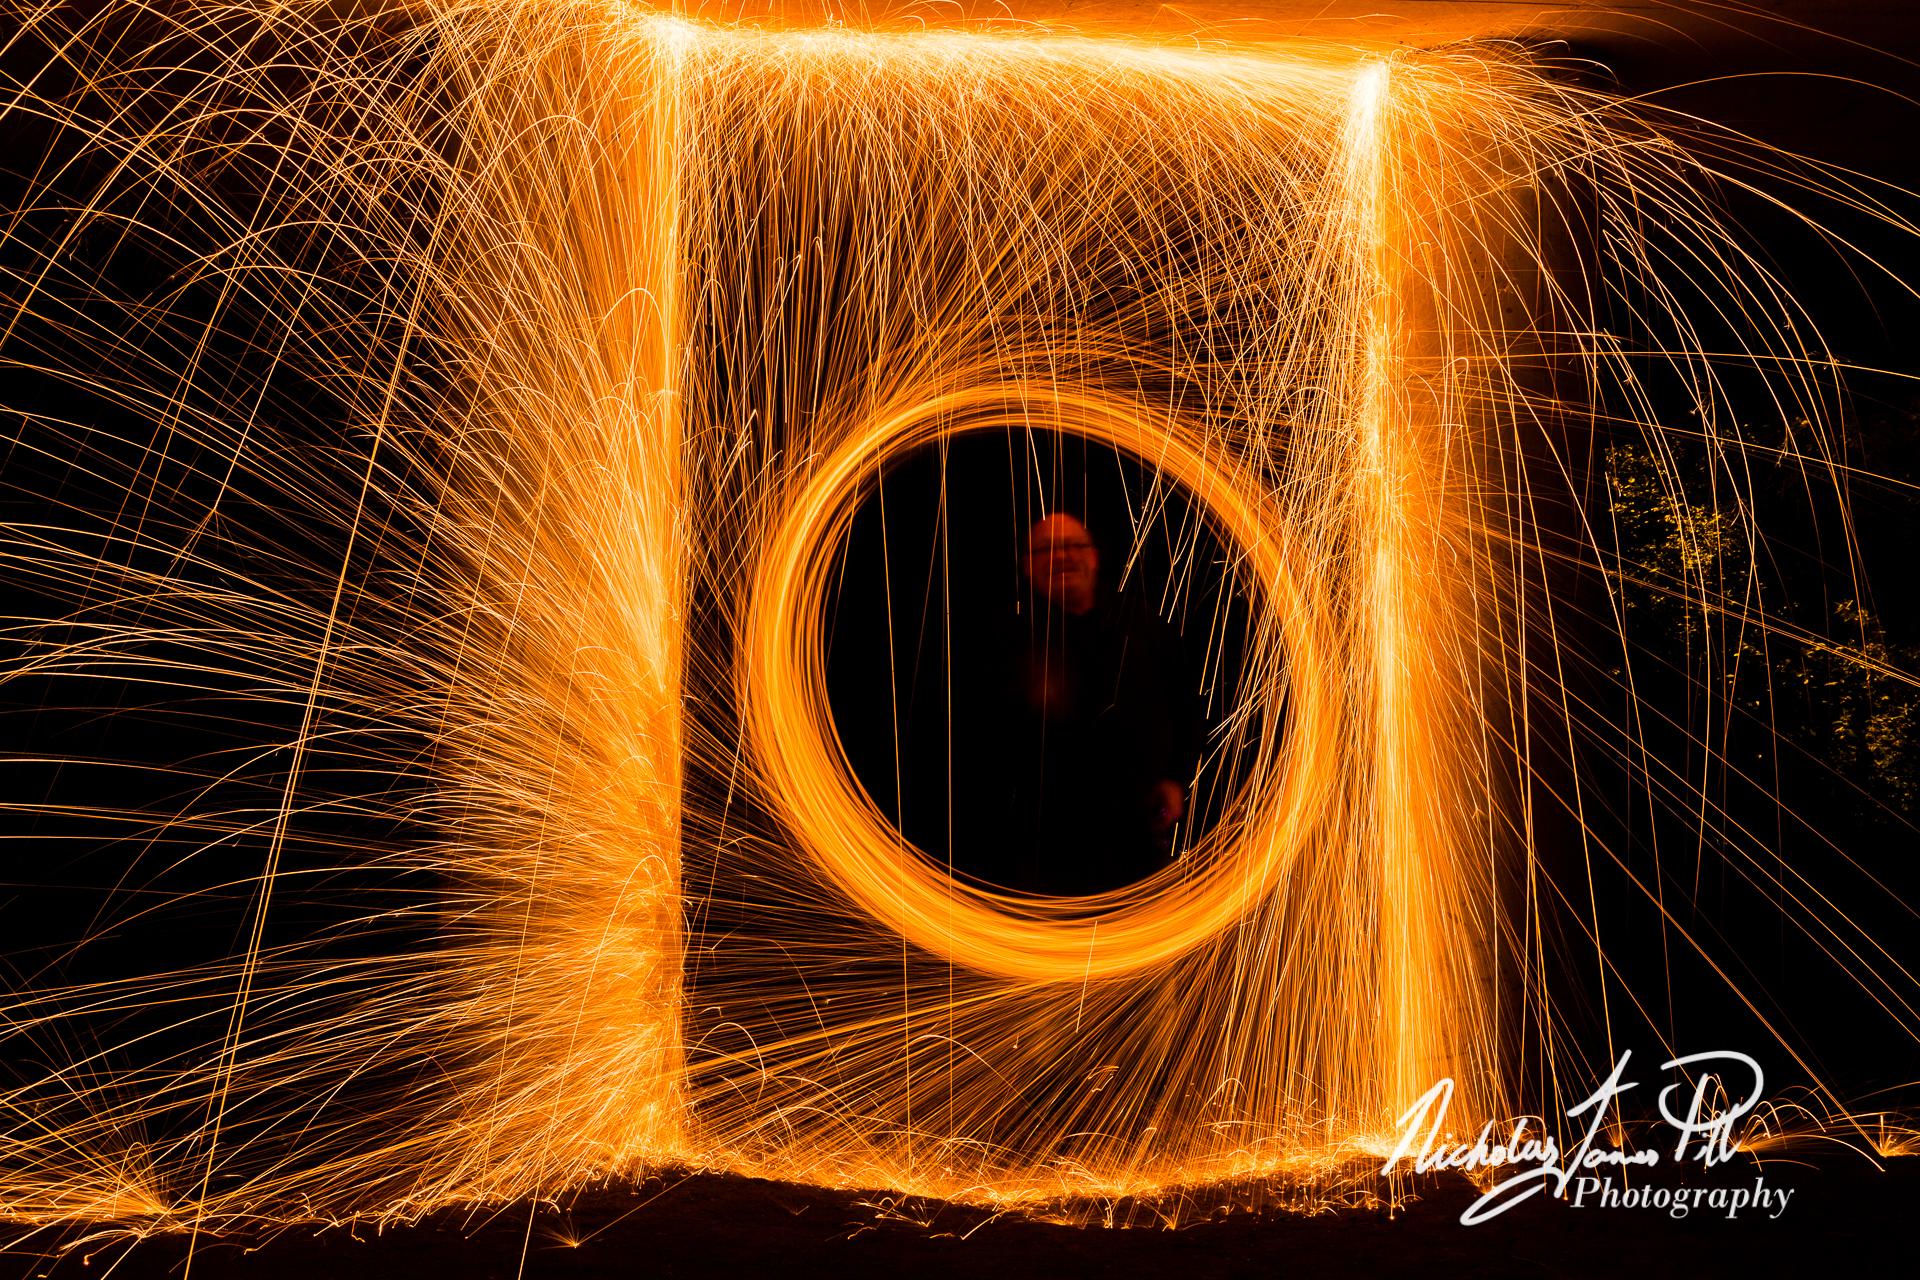 Light Painting - NJP Photography